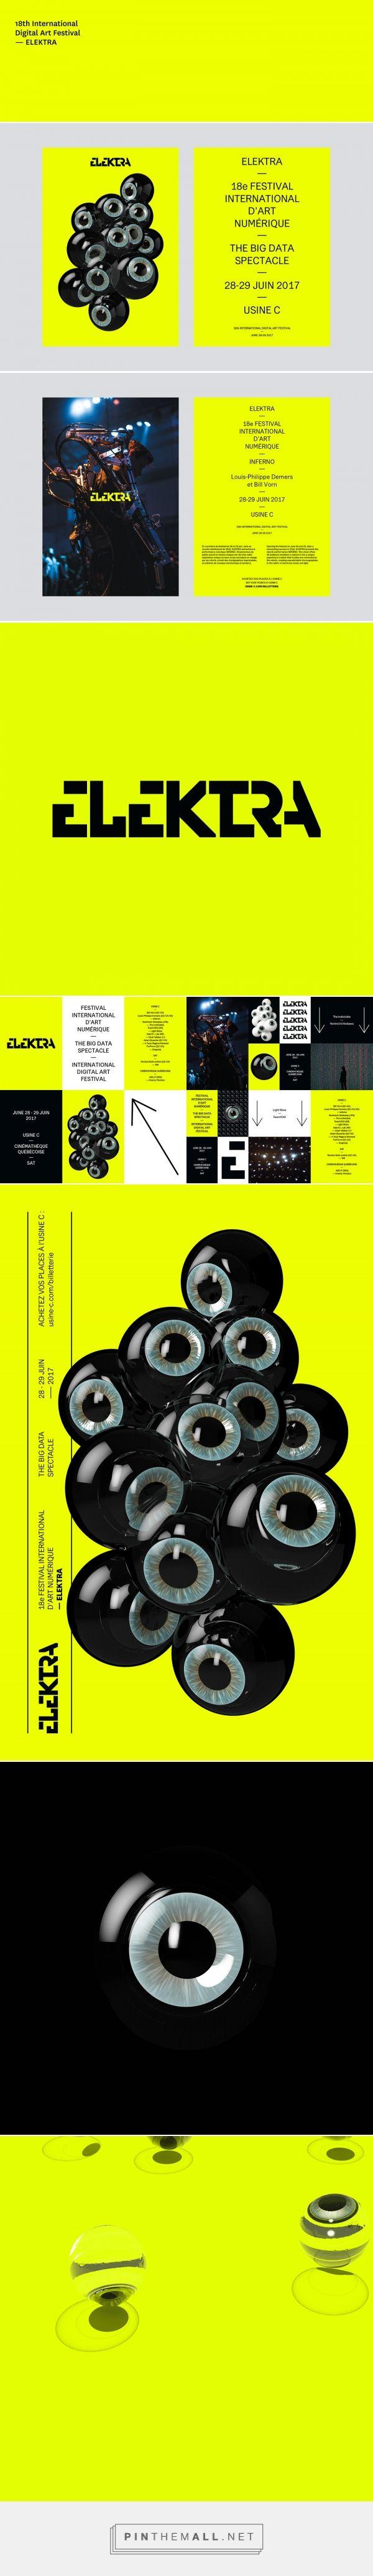 ELEKTRA - 18th International Digital Art Festival on Behance - created via https://pinthemall.net